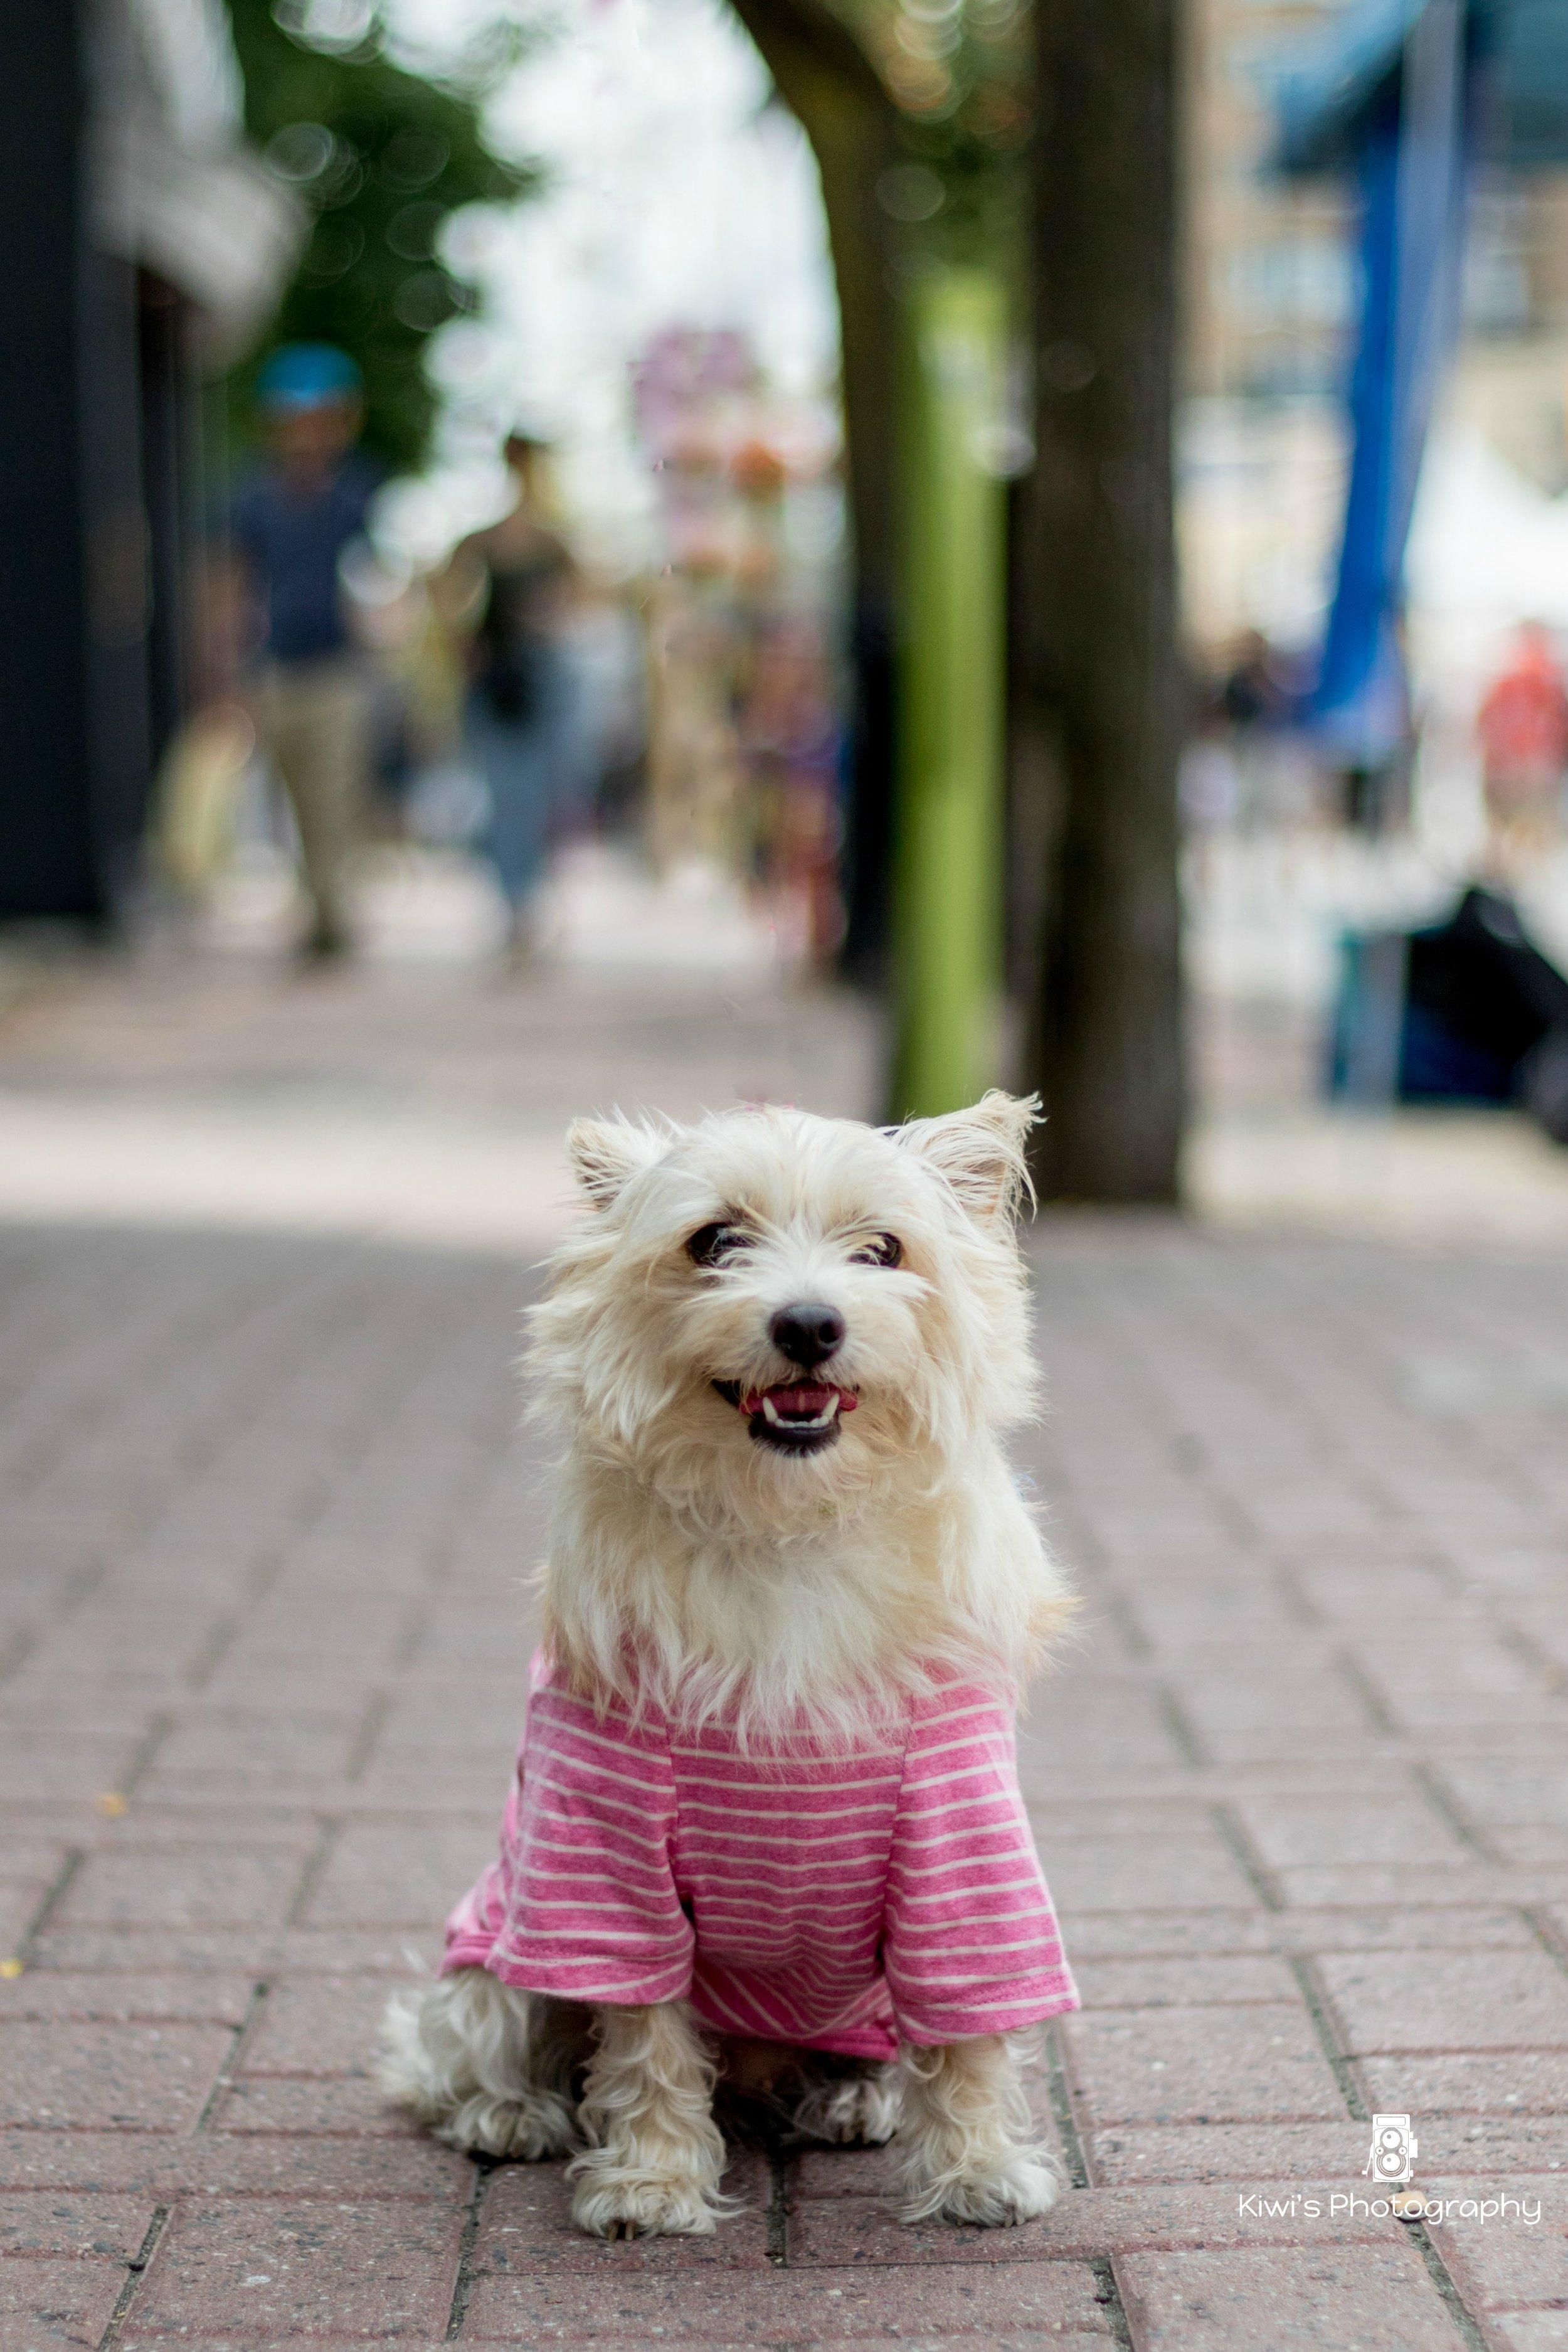 Dog friendly Ottawa: Peach at the Westboro Fuse